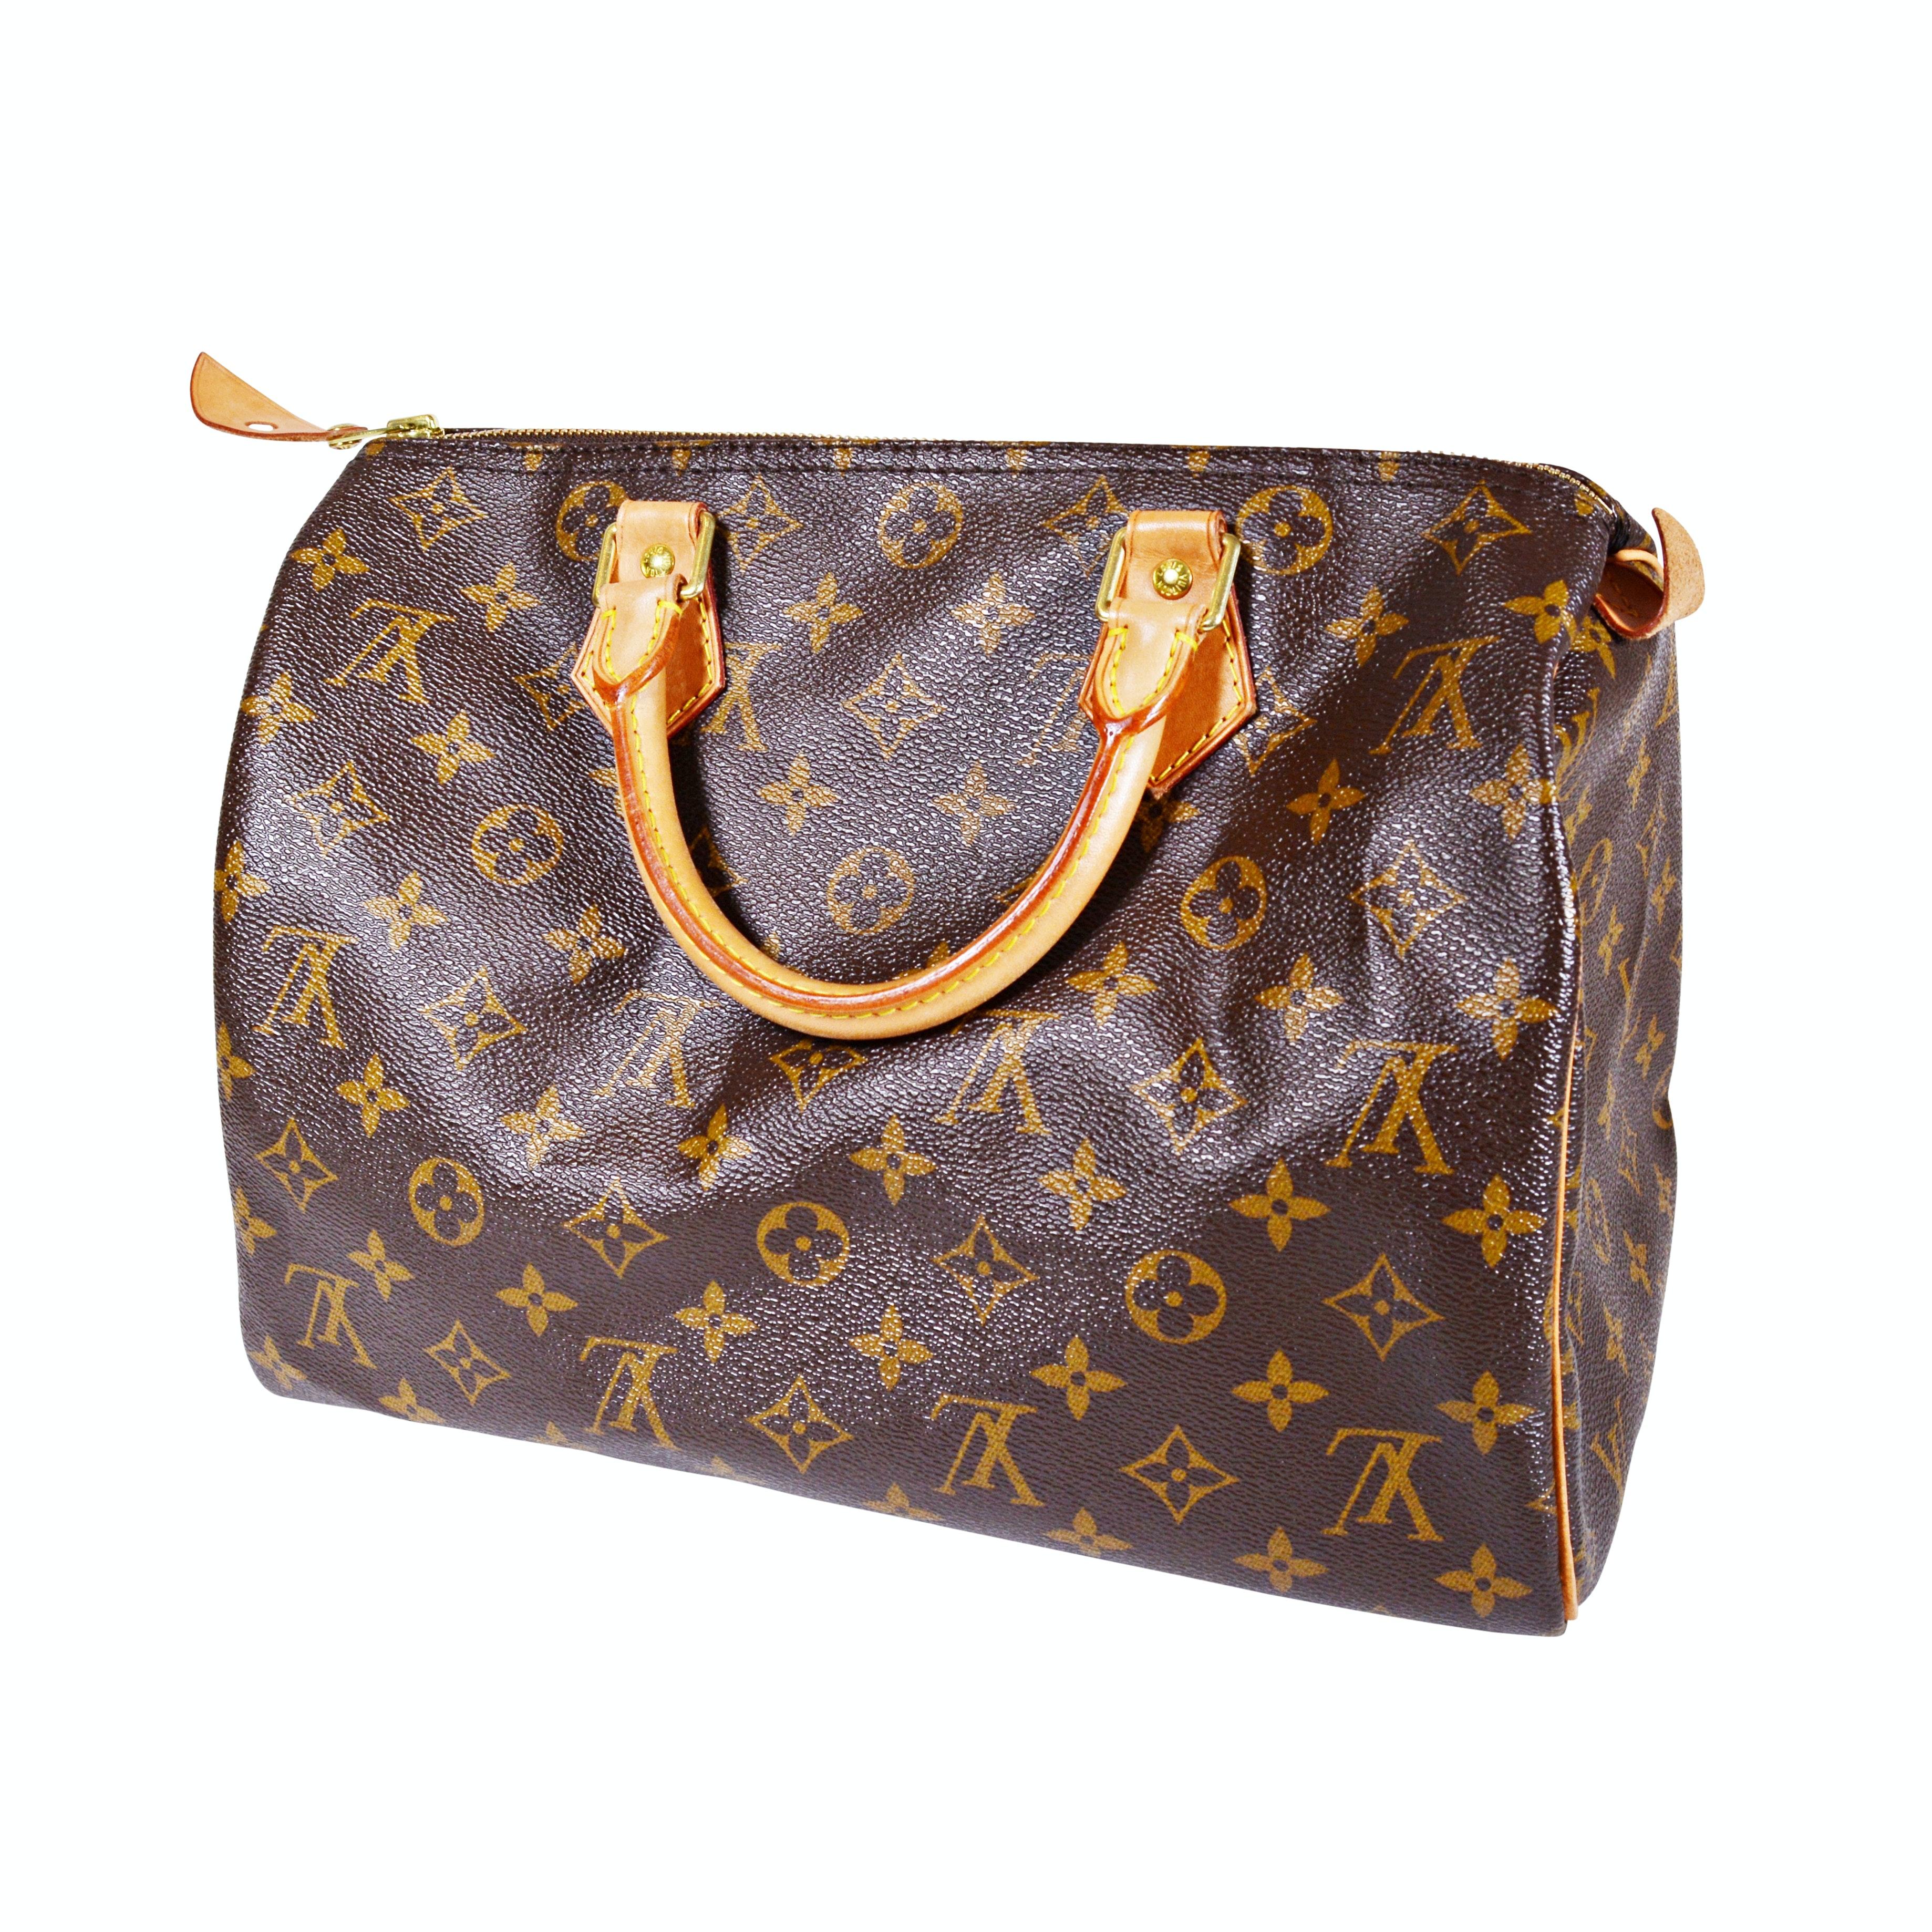 Louis Vuitton Monogram Canvas Speedy Handbag